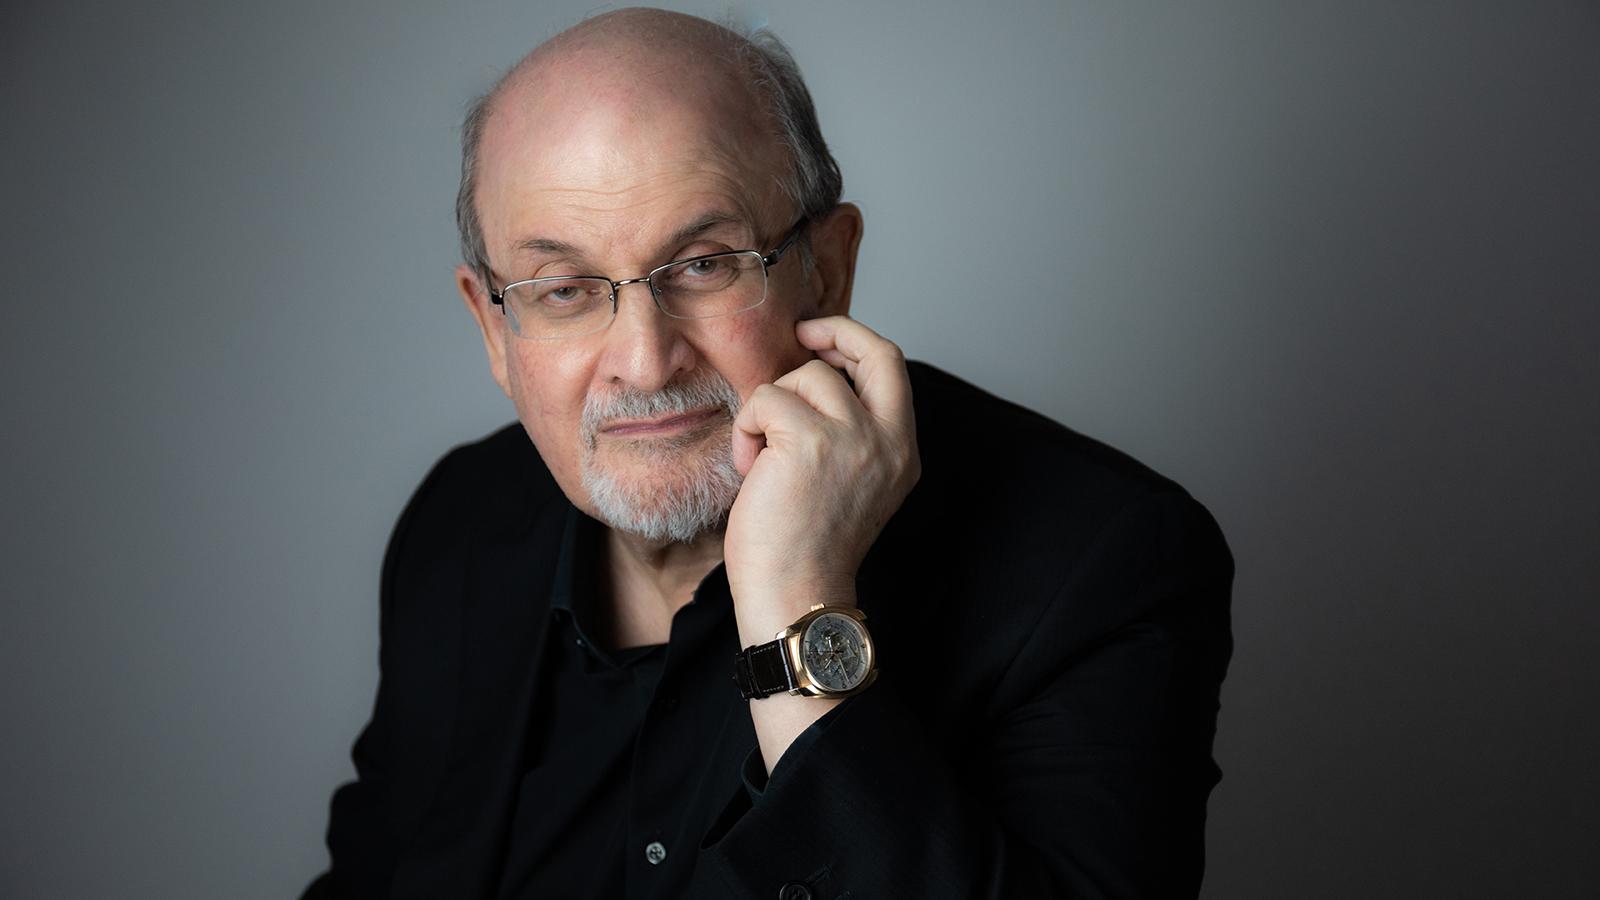 [Salman Rushdie] Photo by Rachel Eliza Griffith